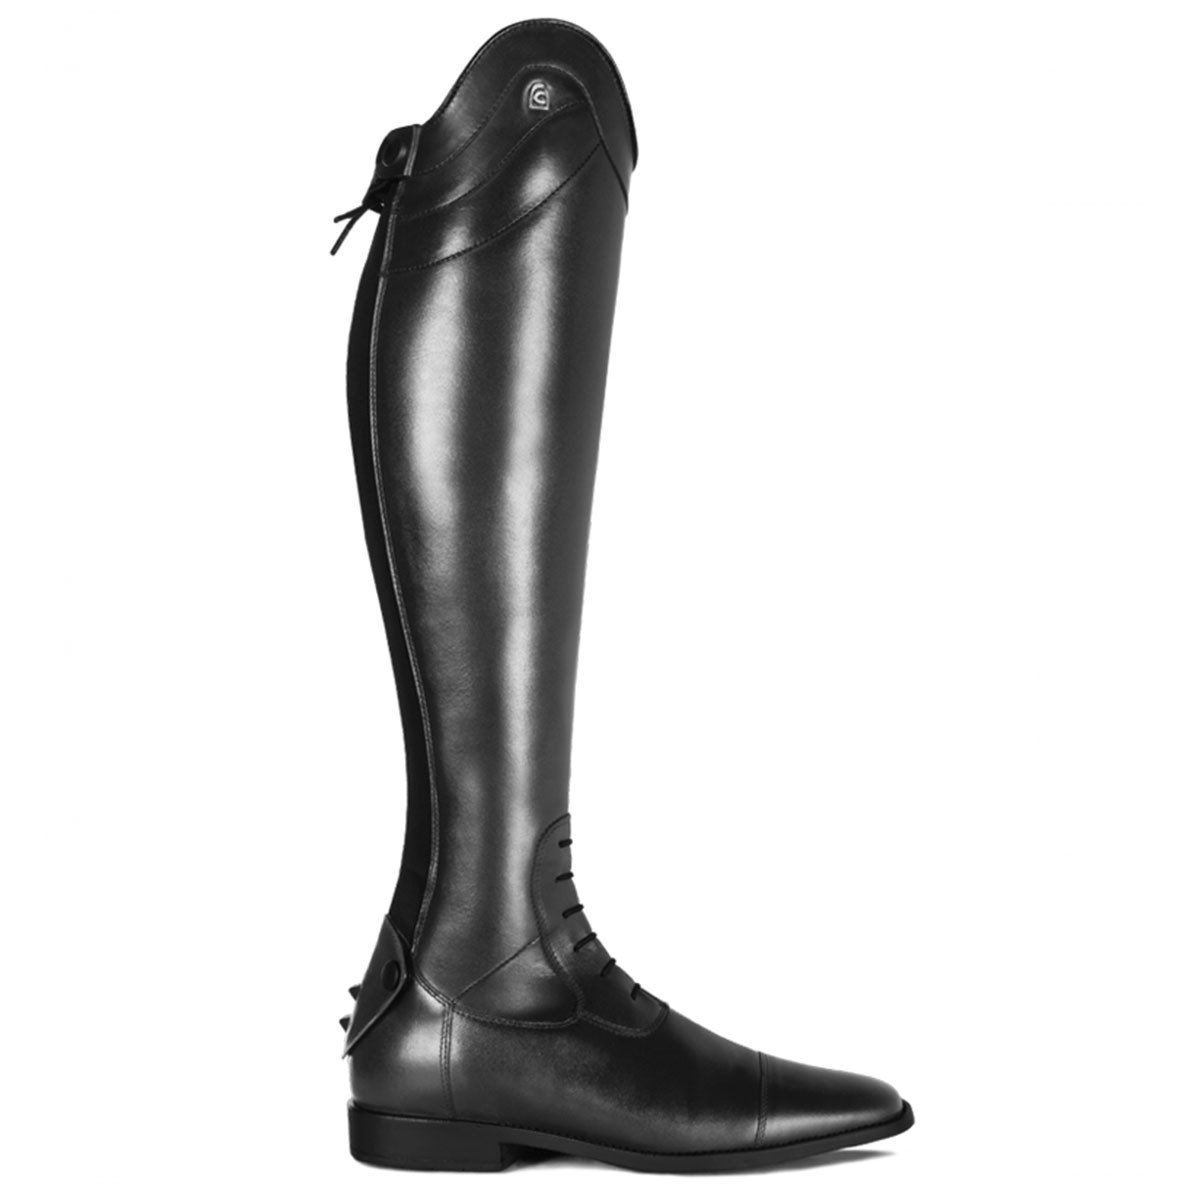 Cavallo Linus Slim rijlaars zwart maat:7-7.5 - h48-w33